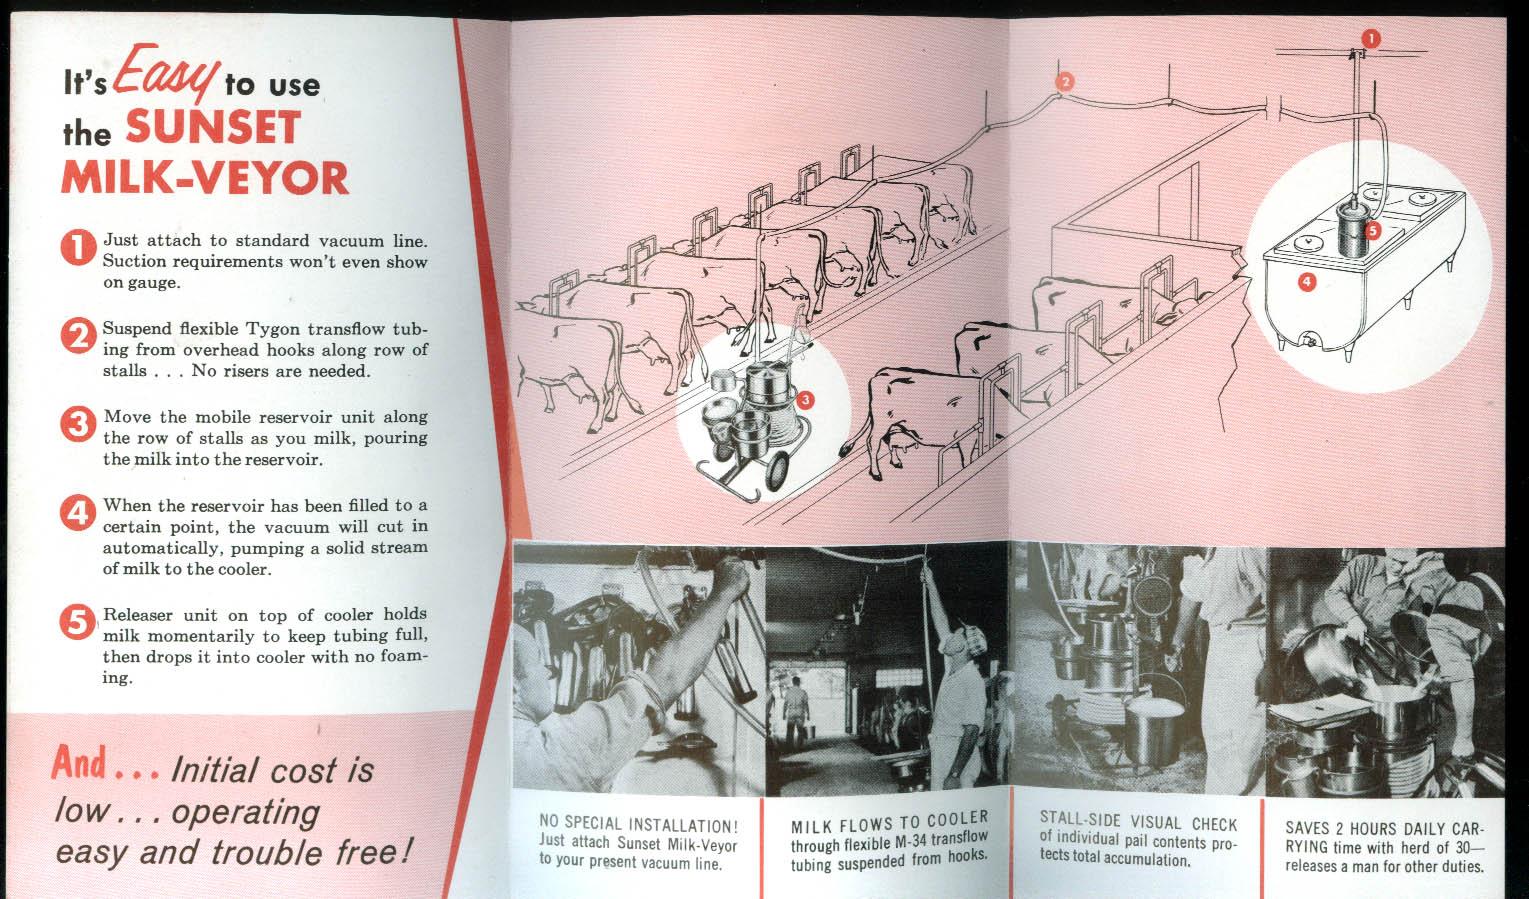 Sunset Milk-Veyor Stall-to-Cooler Dairy Farm Appliance folder 1950s